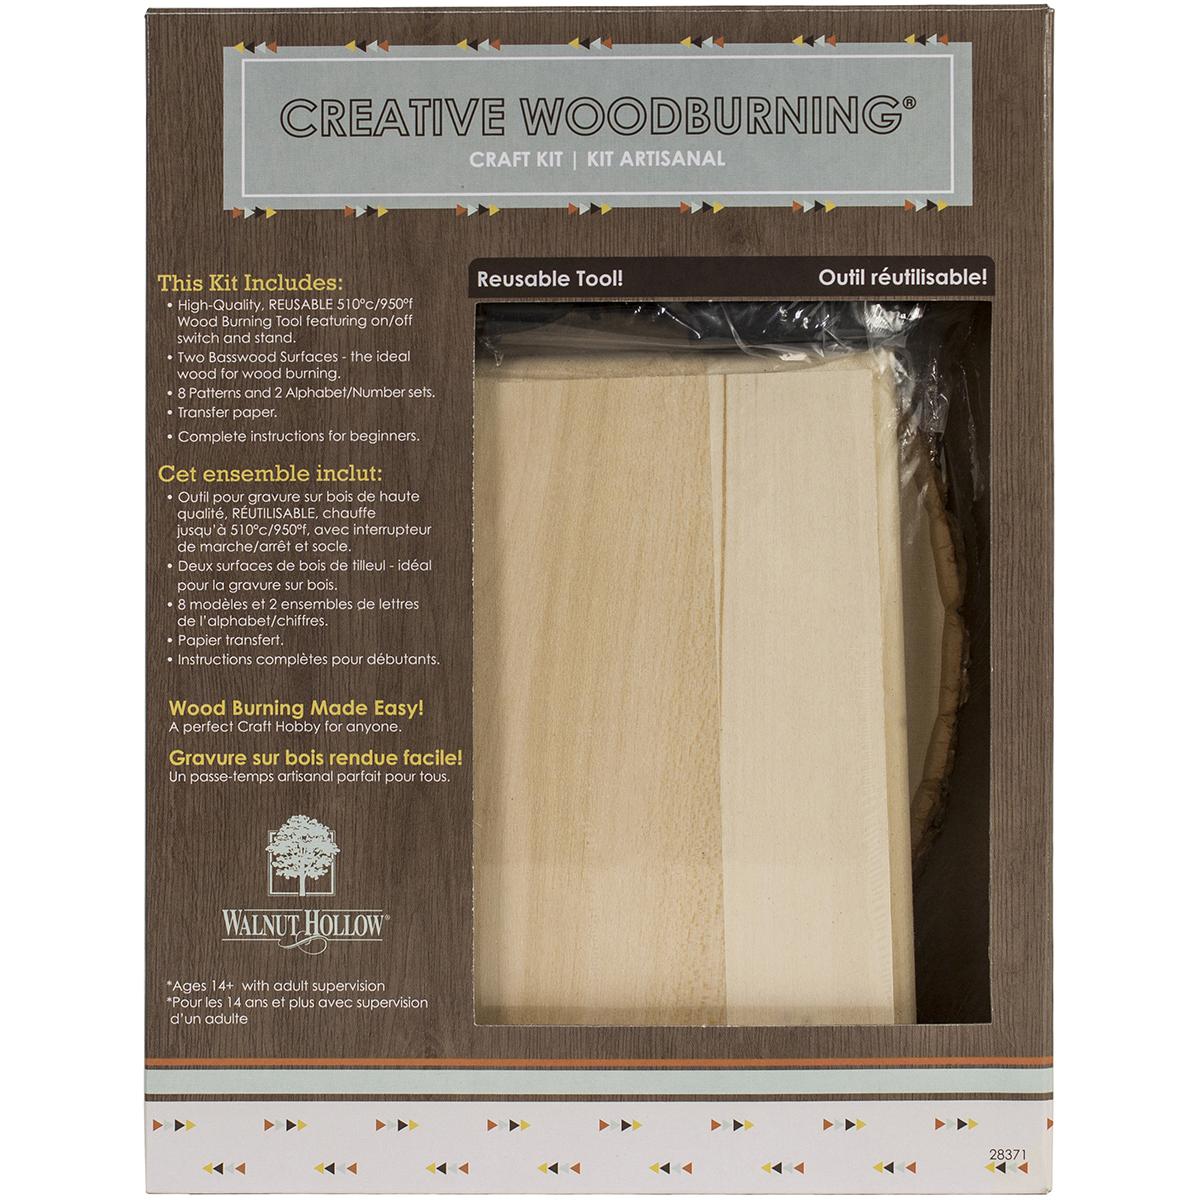 Creative Woodburning Craft Kit